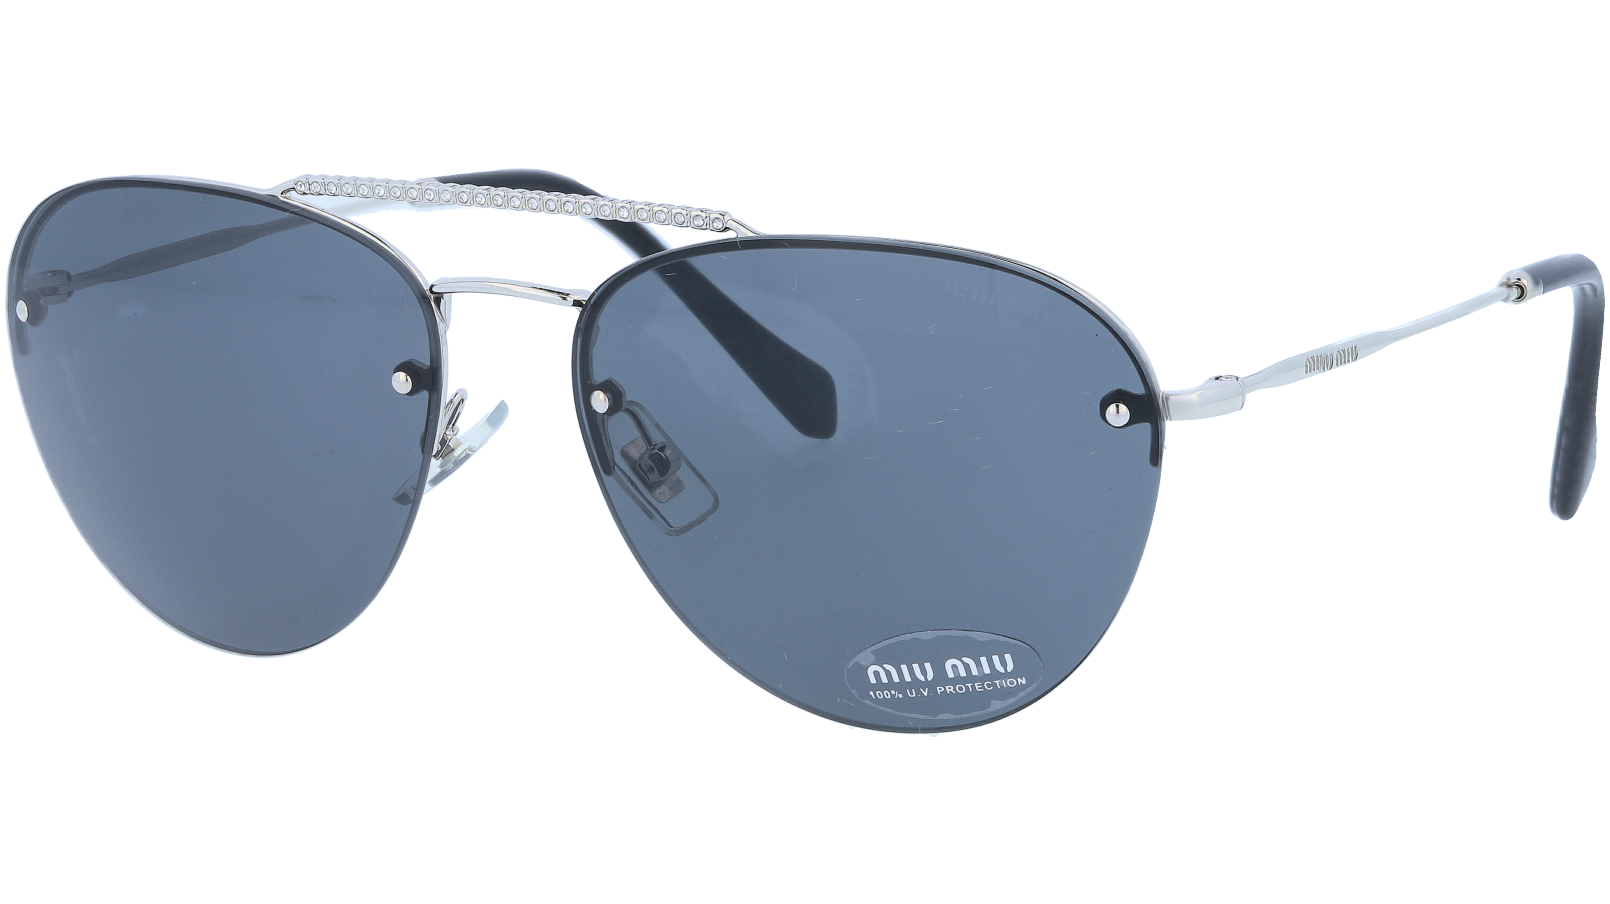 Miu Miu MU54US 1BC1A1 59 Grey Silver Sunglasses